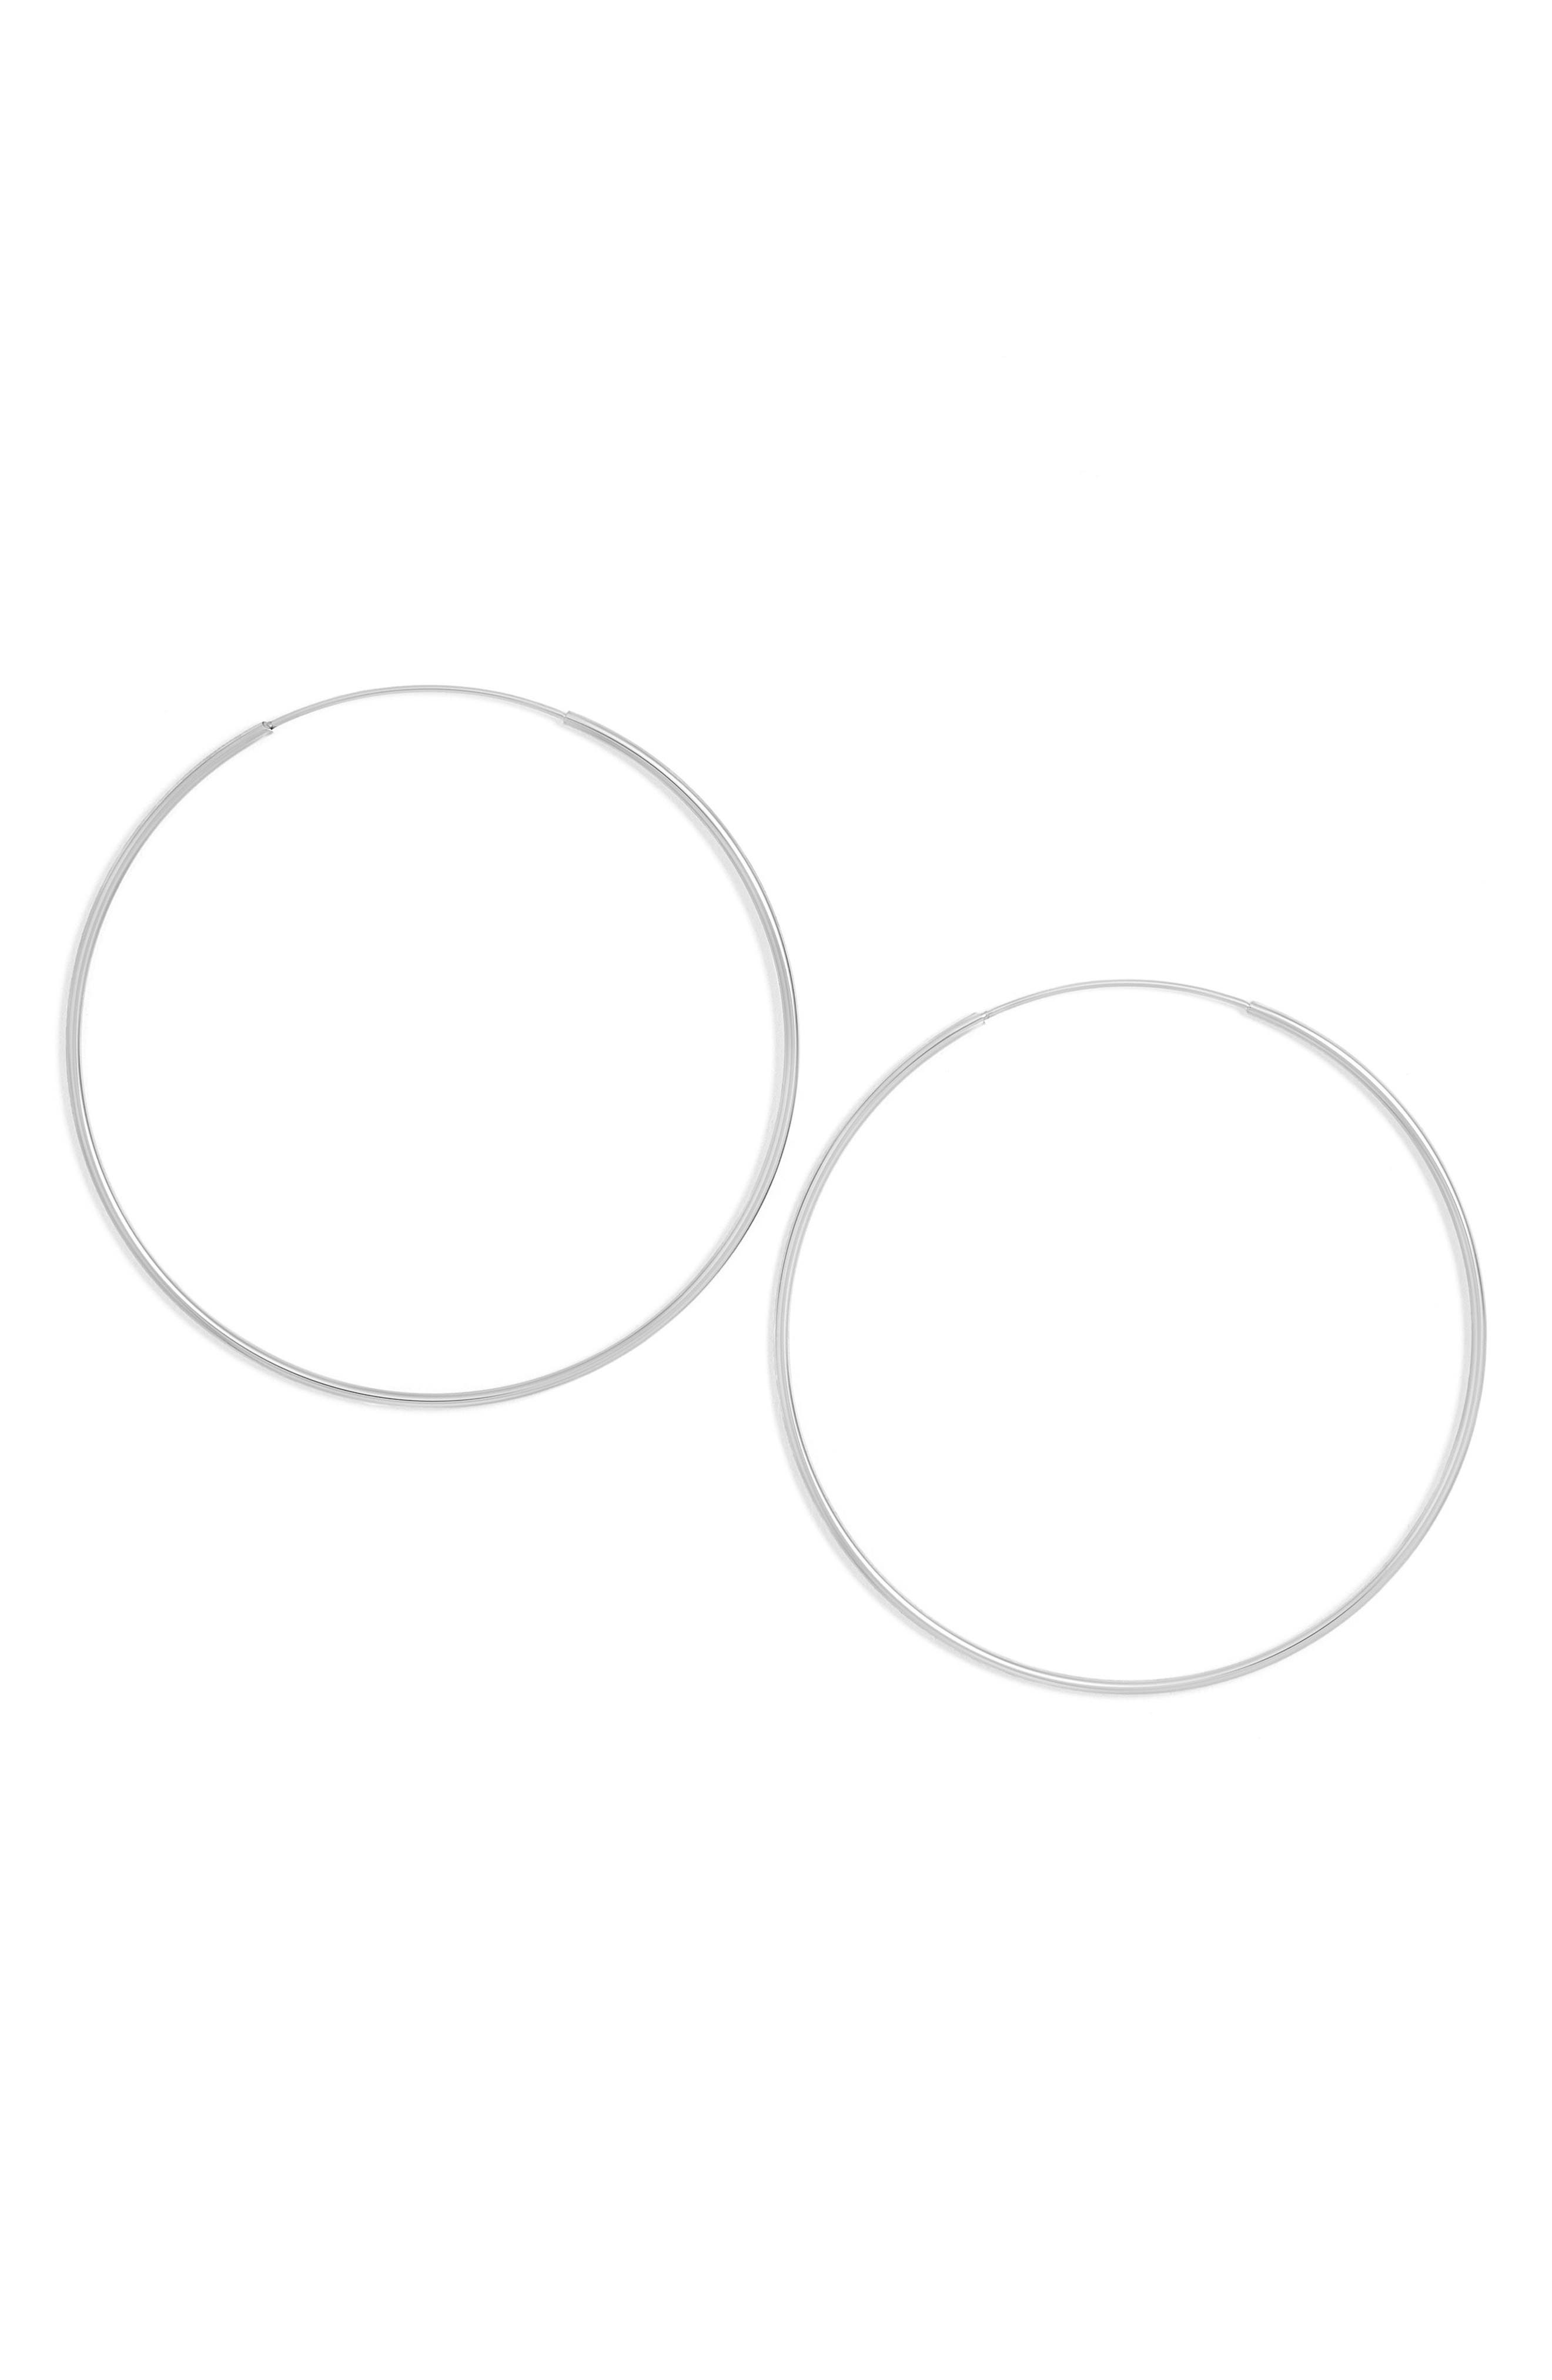 Starlet Hoop Earrings,                             Main thumbnail 1, color,                             Silver